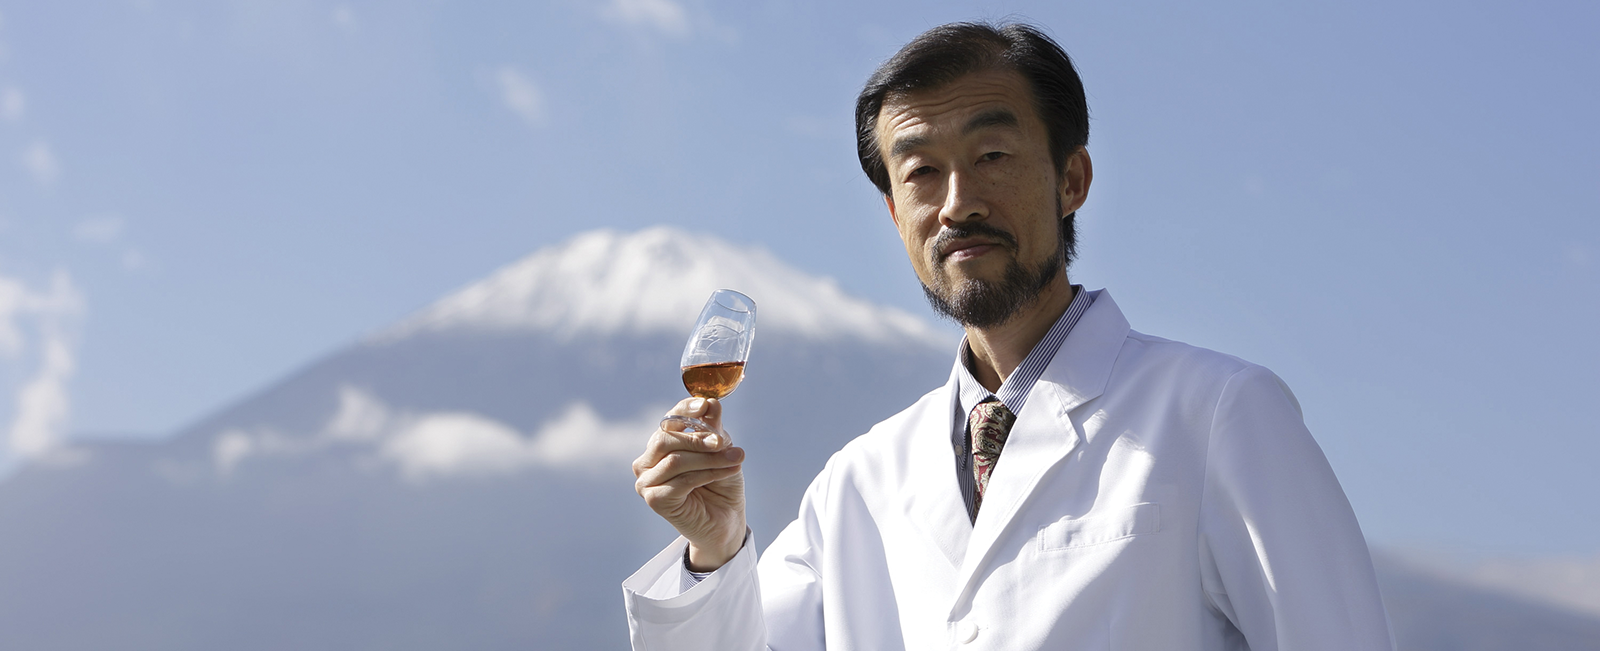 Jota TANAKA - KIRIN Maitre distillateur whisky japonais Dugas club Expert